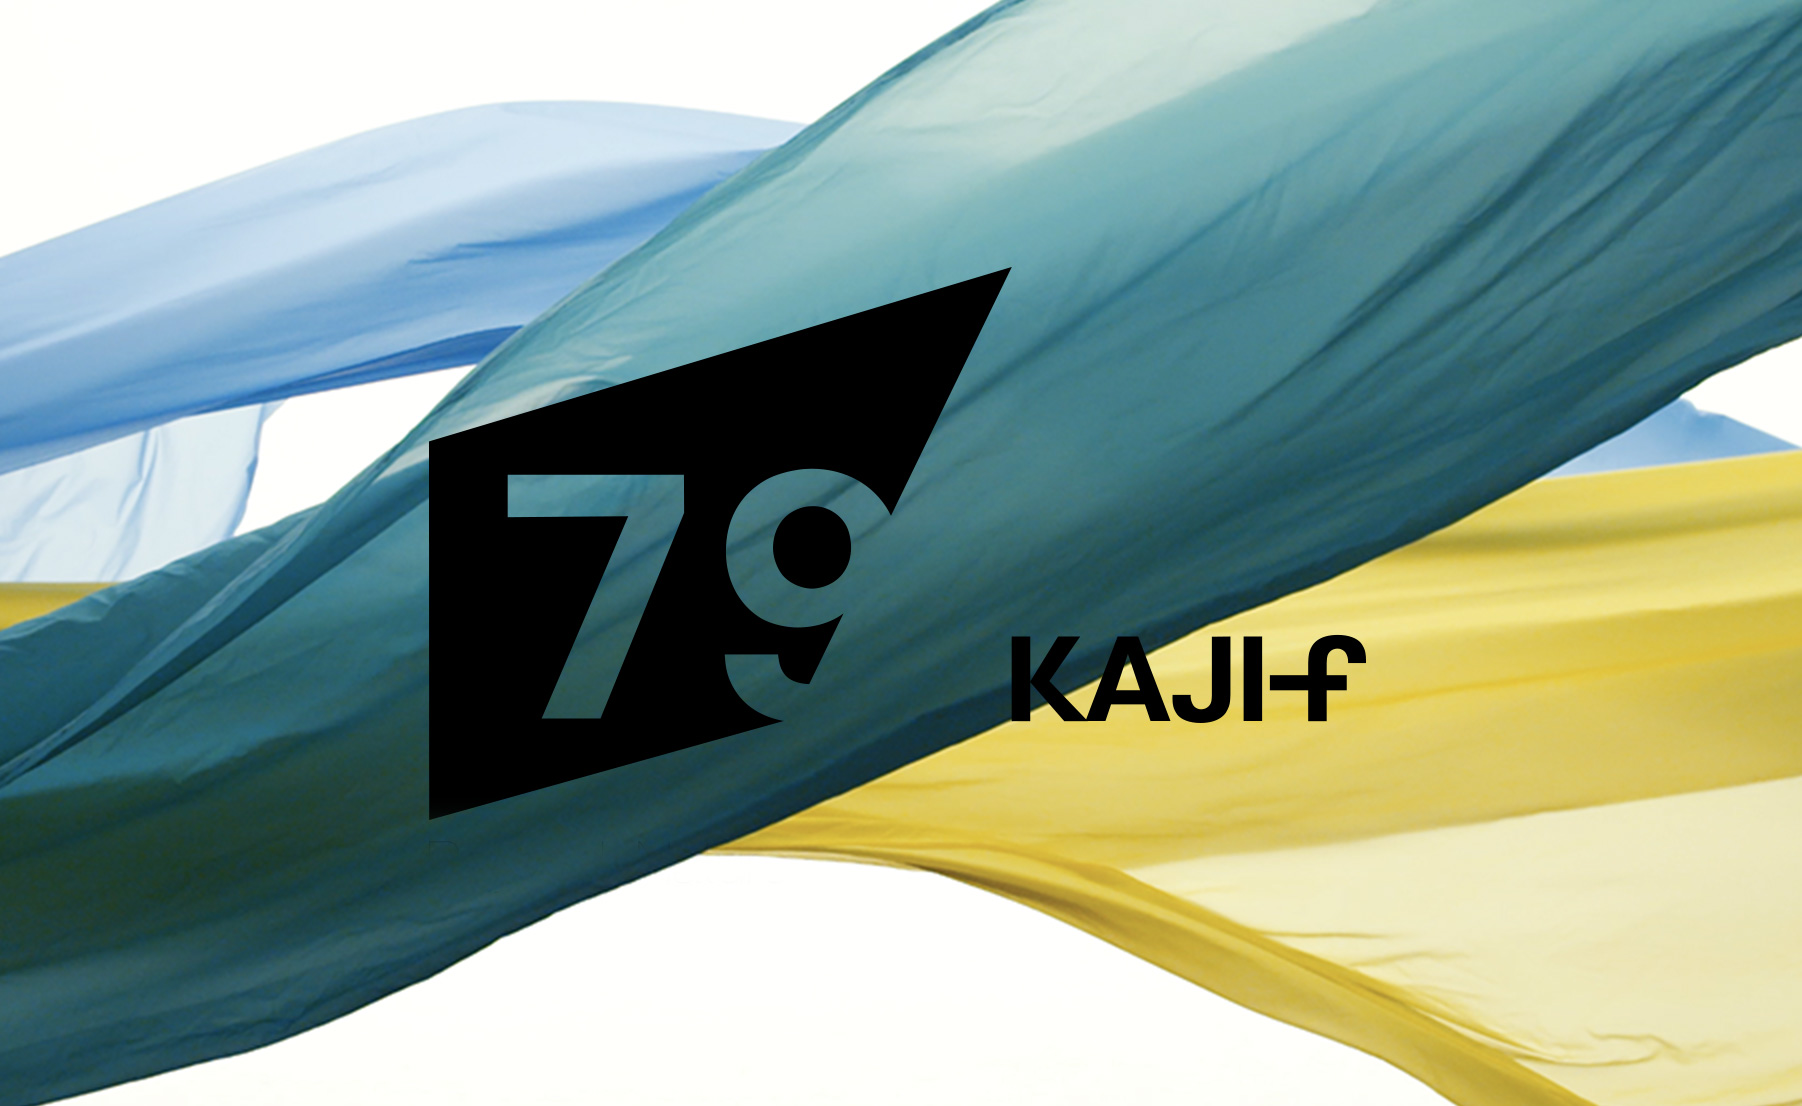 KAJIF Textile brand